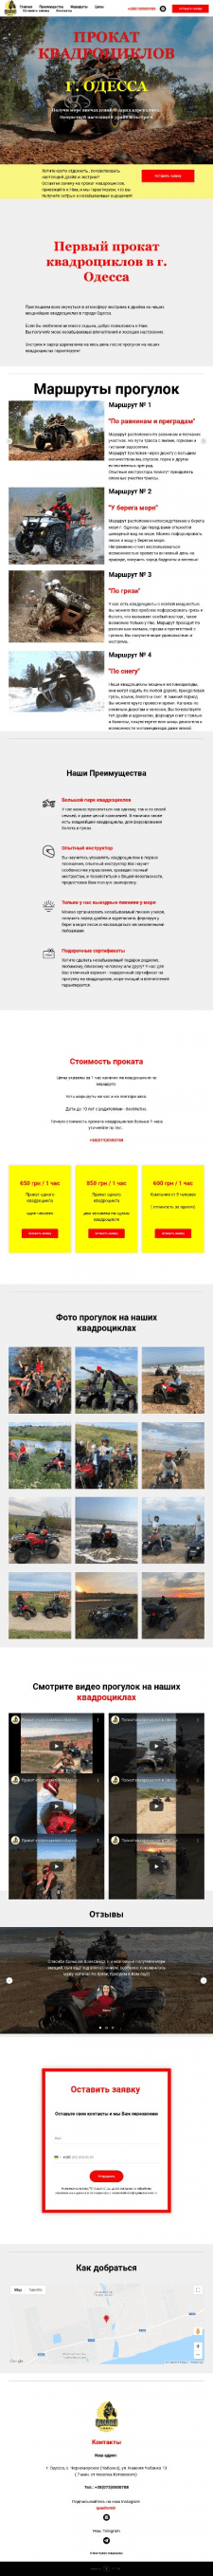 Сайт-визитка прокат квадроциклов в г.Одессе